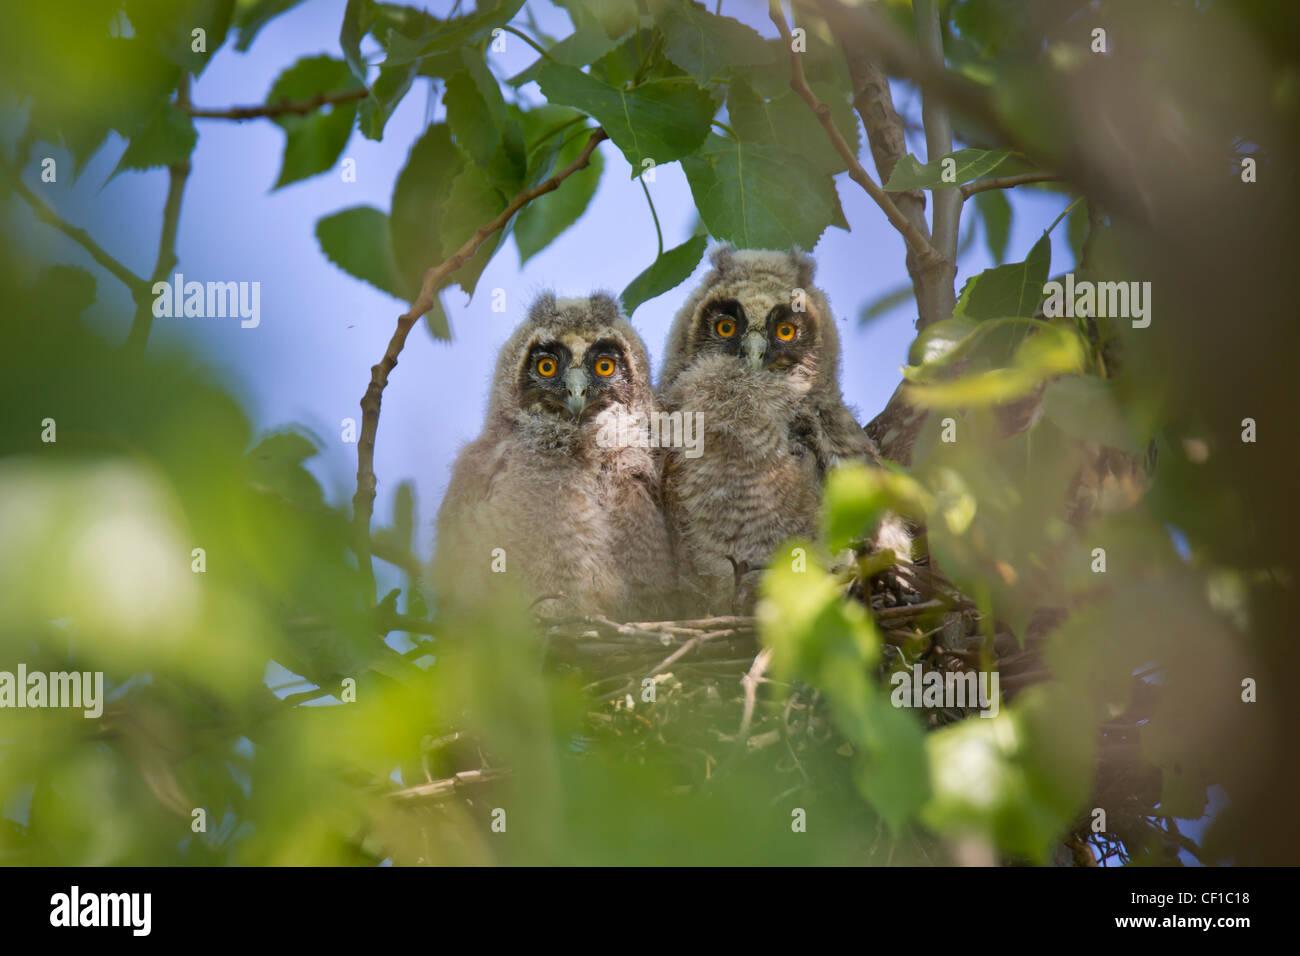 Waldohreule, Asio otus, long-eared owl - Stock Image